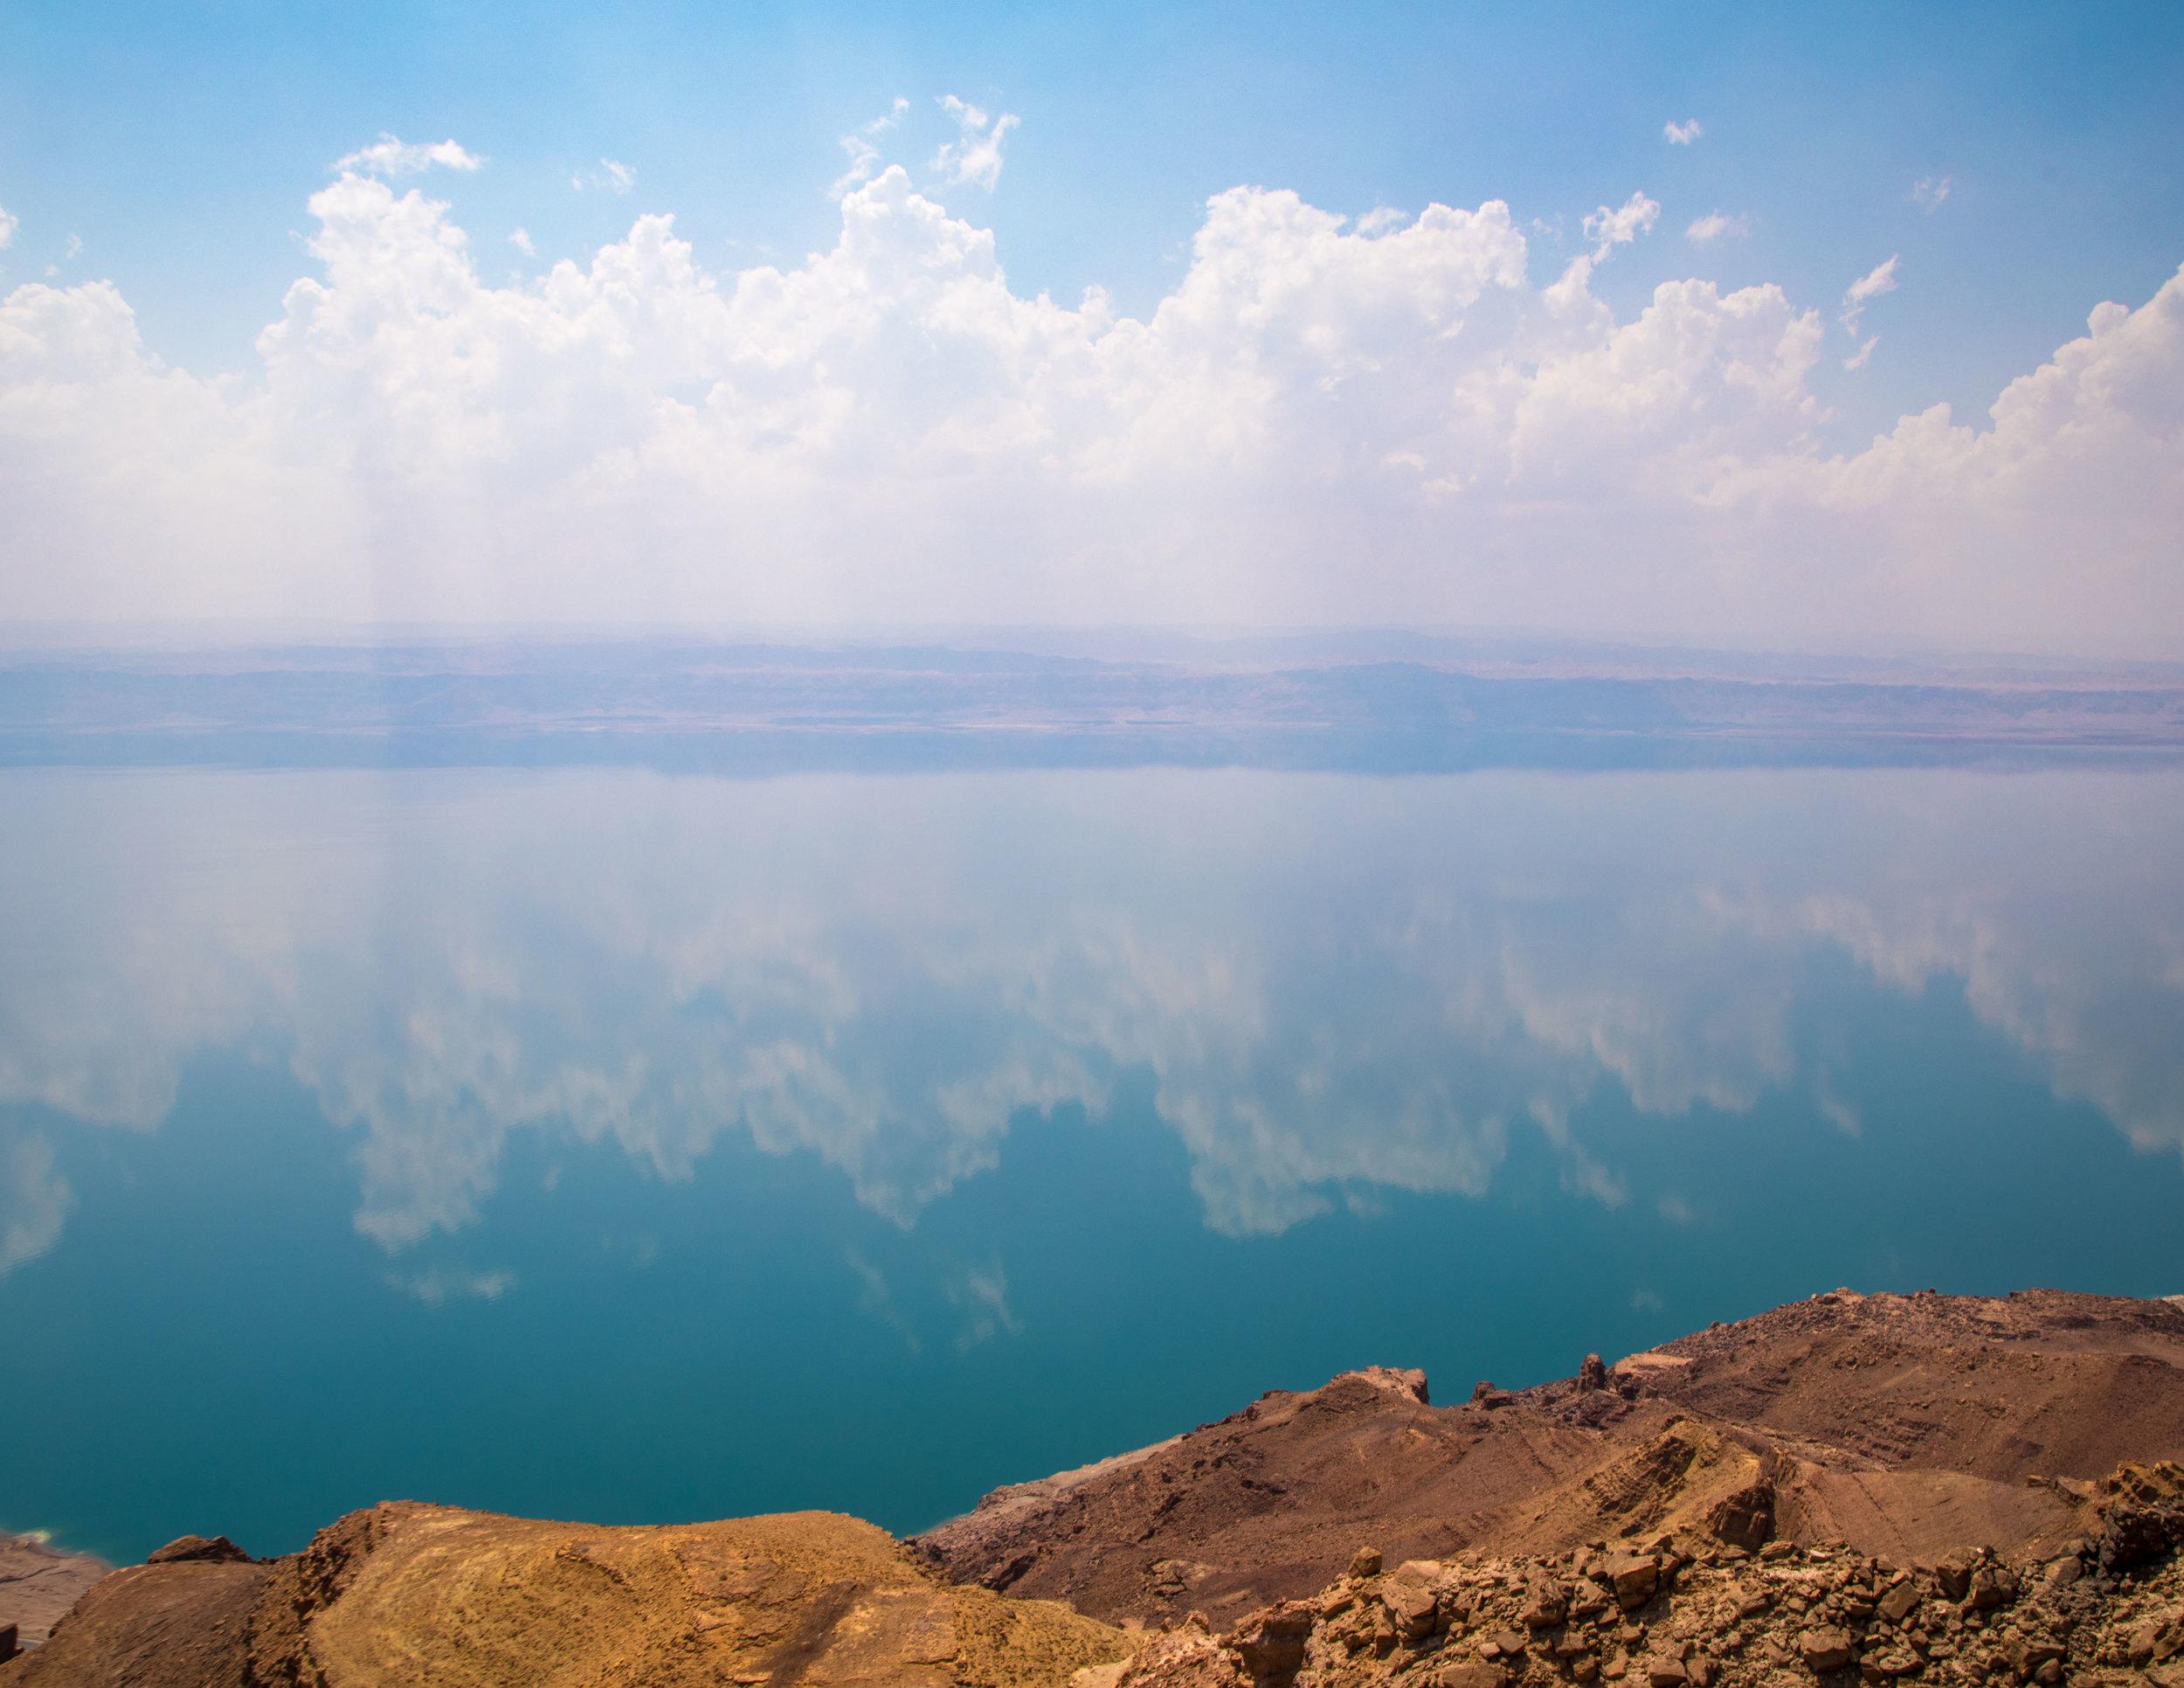 Places to visit in Jordan - Dead Sea